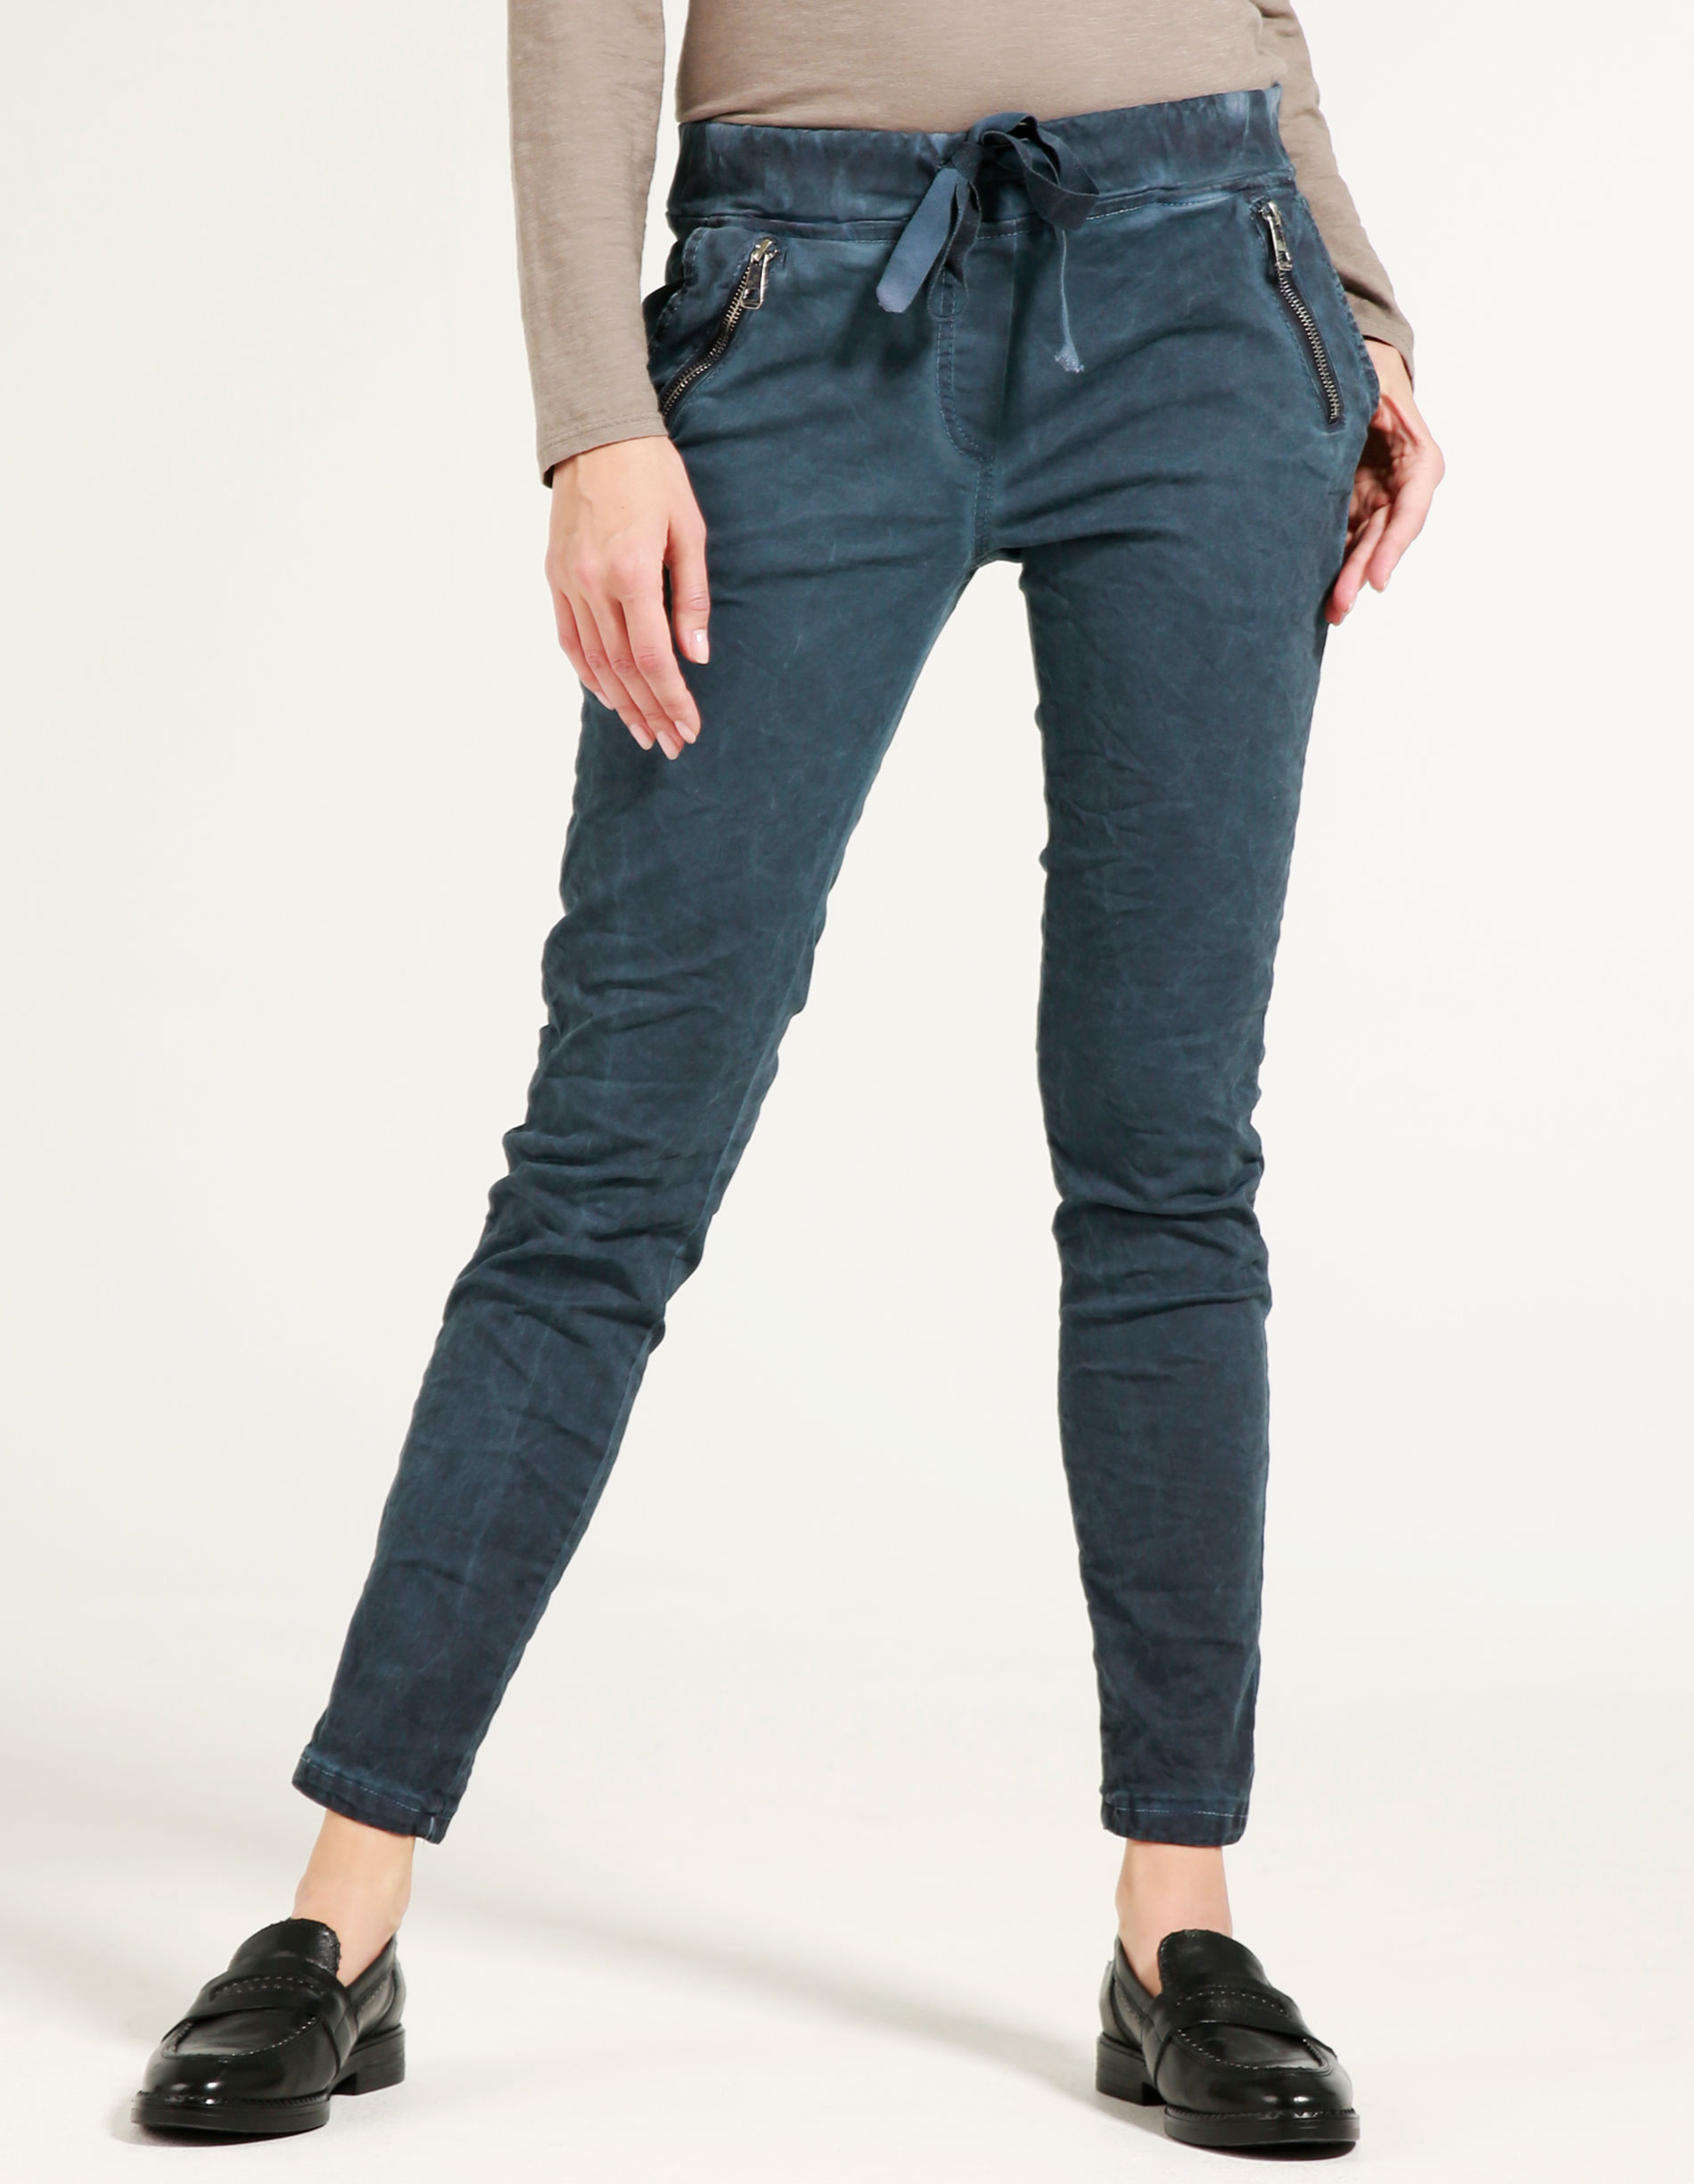 Spodnie - 30-618126 BLS - Unisono